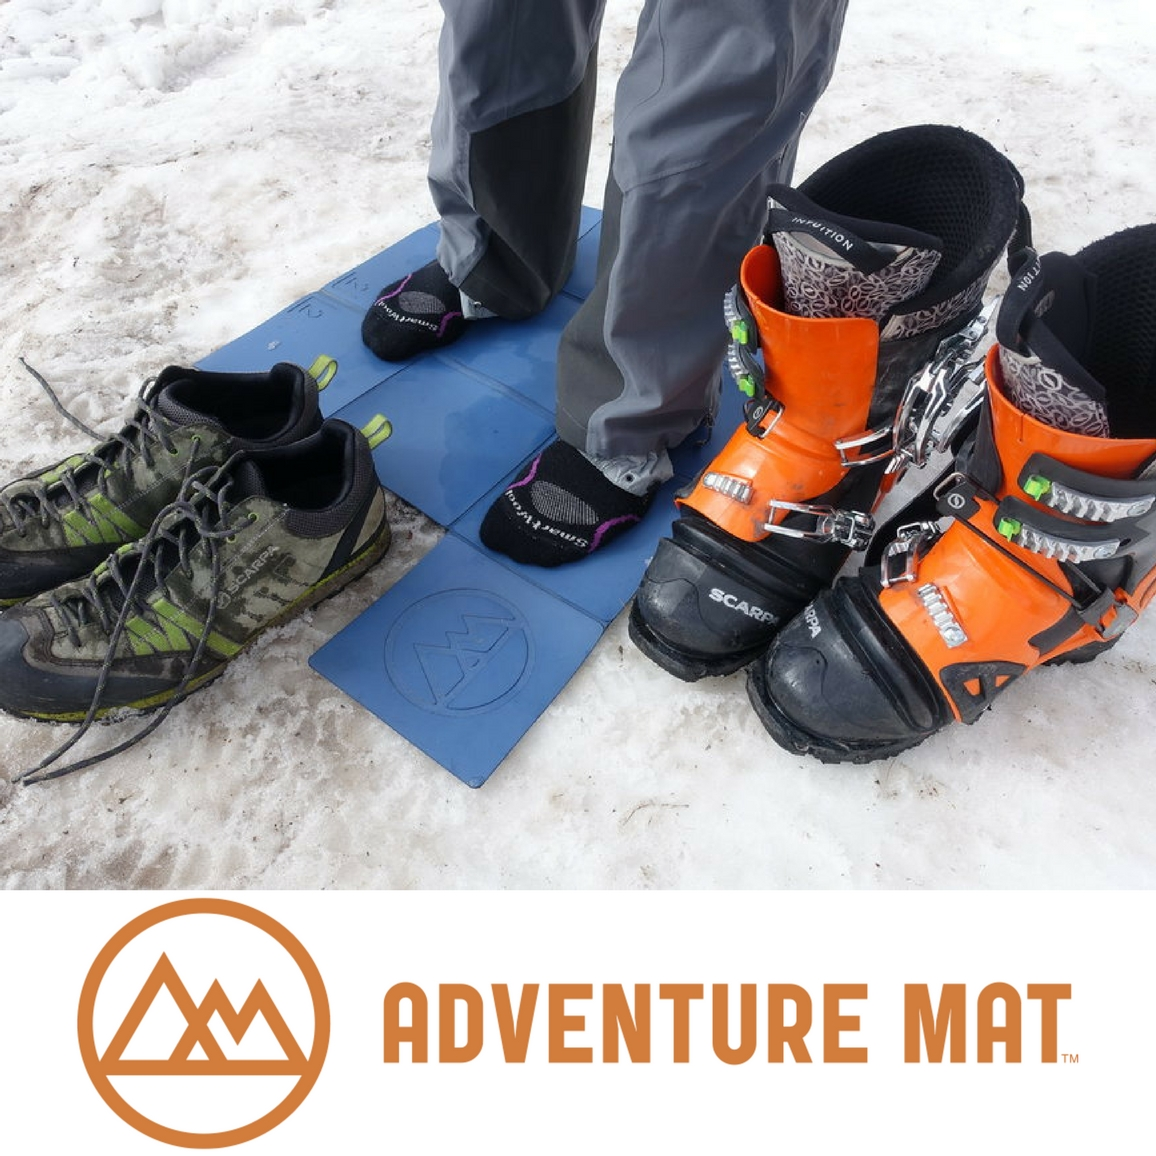 Adventure Mat Brand image.jpg